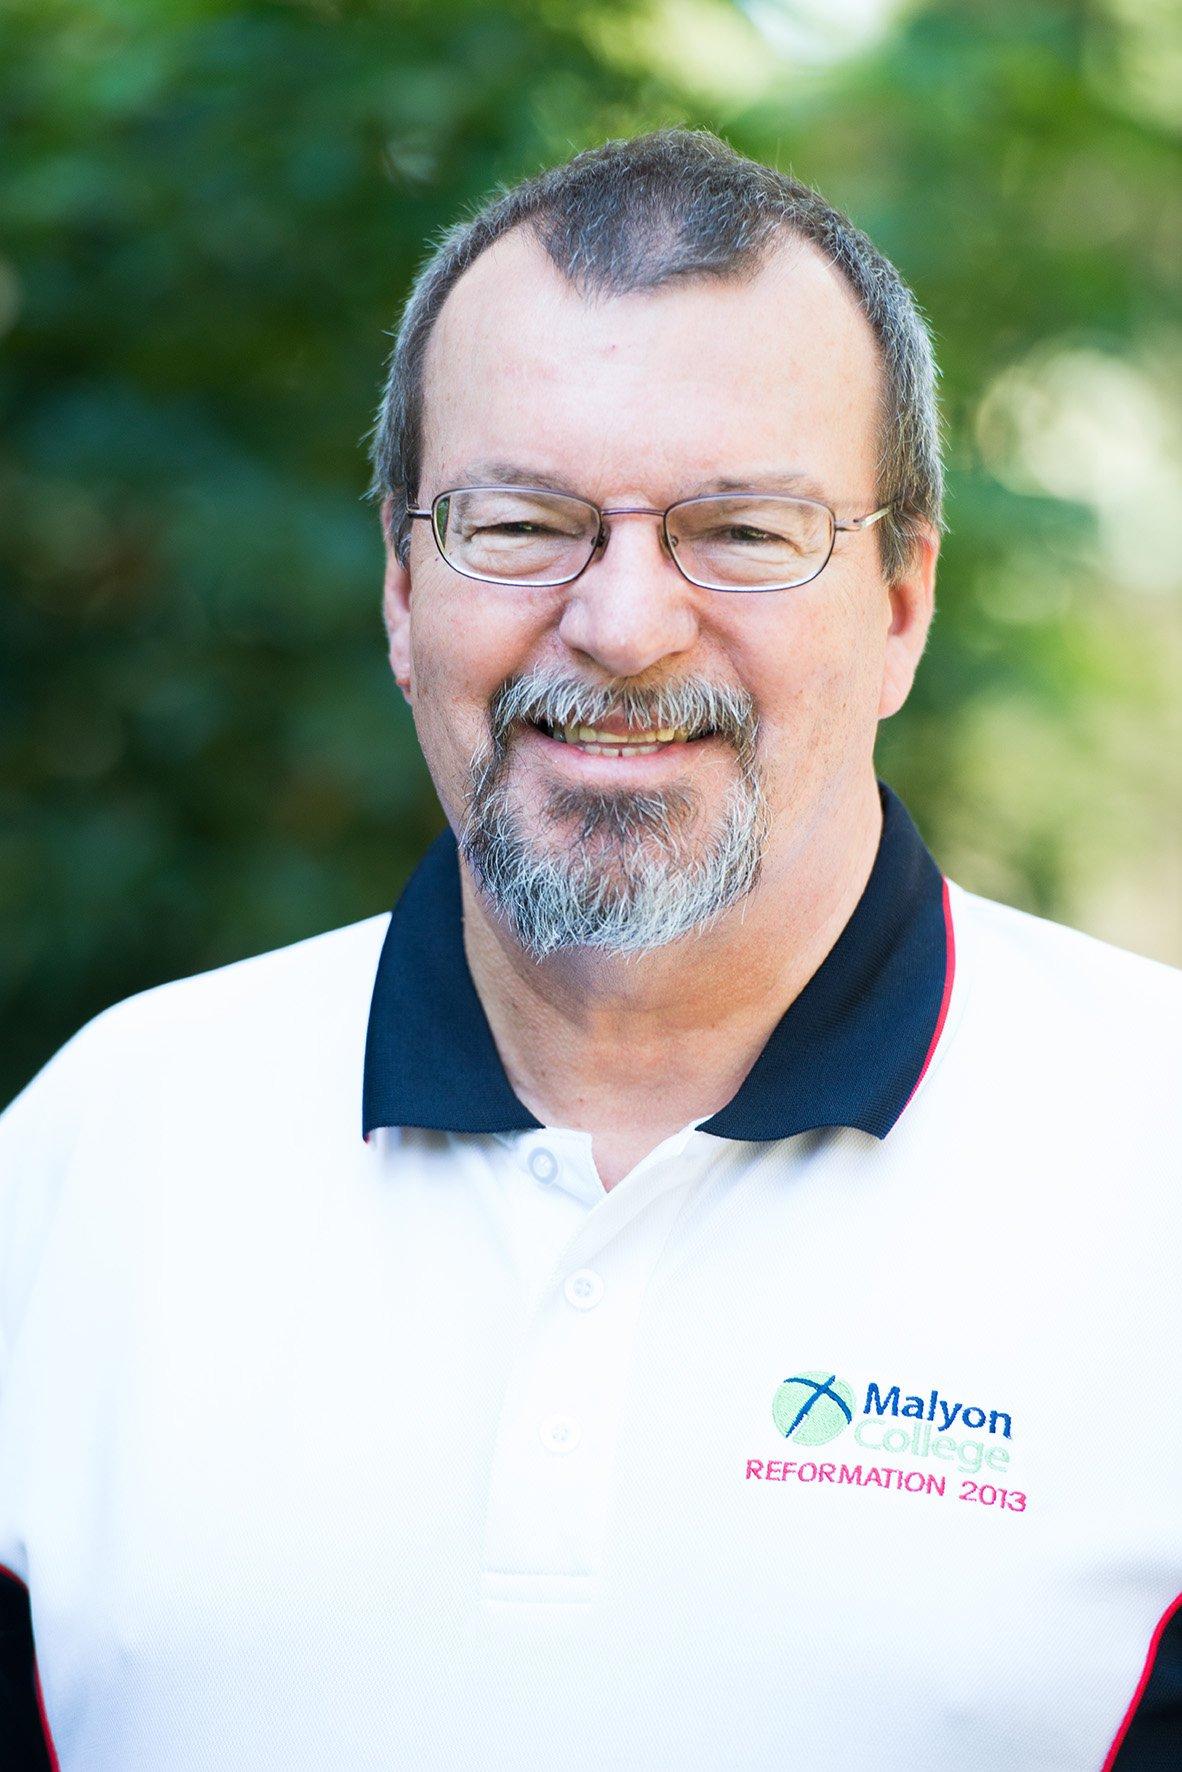 Rev Dr D Morcom - Malyon College